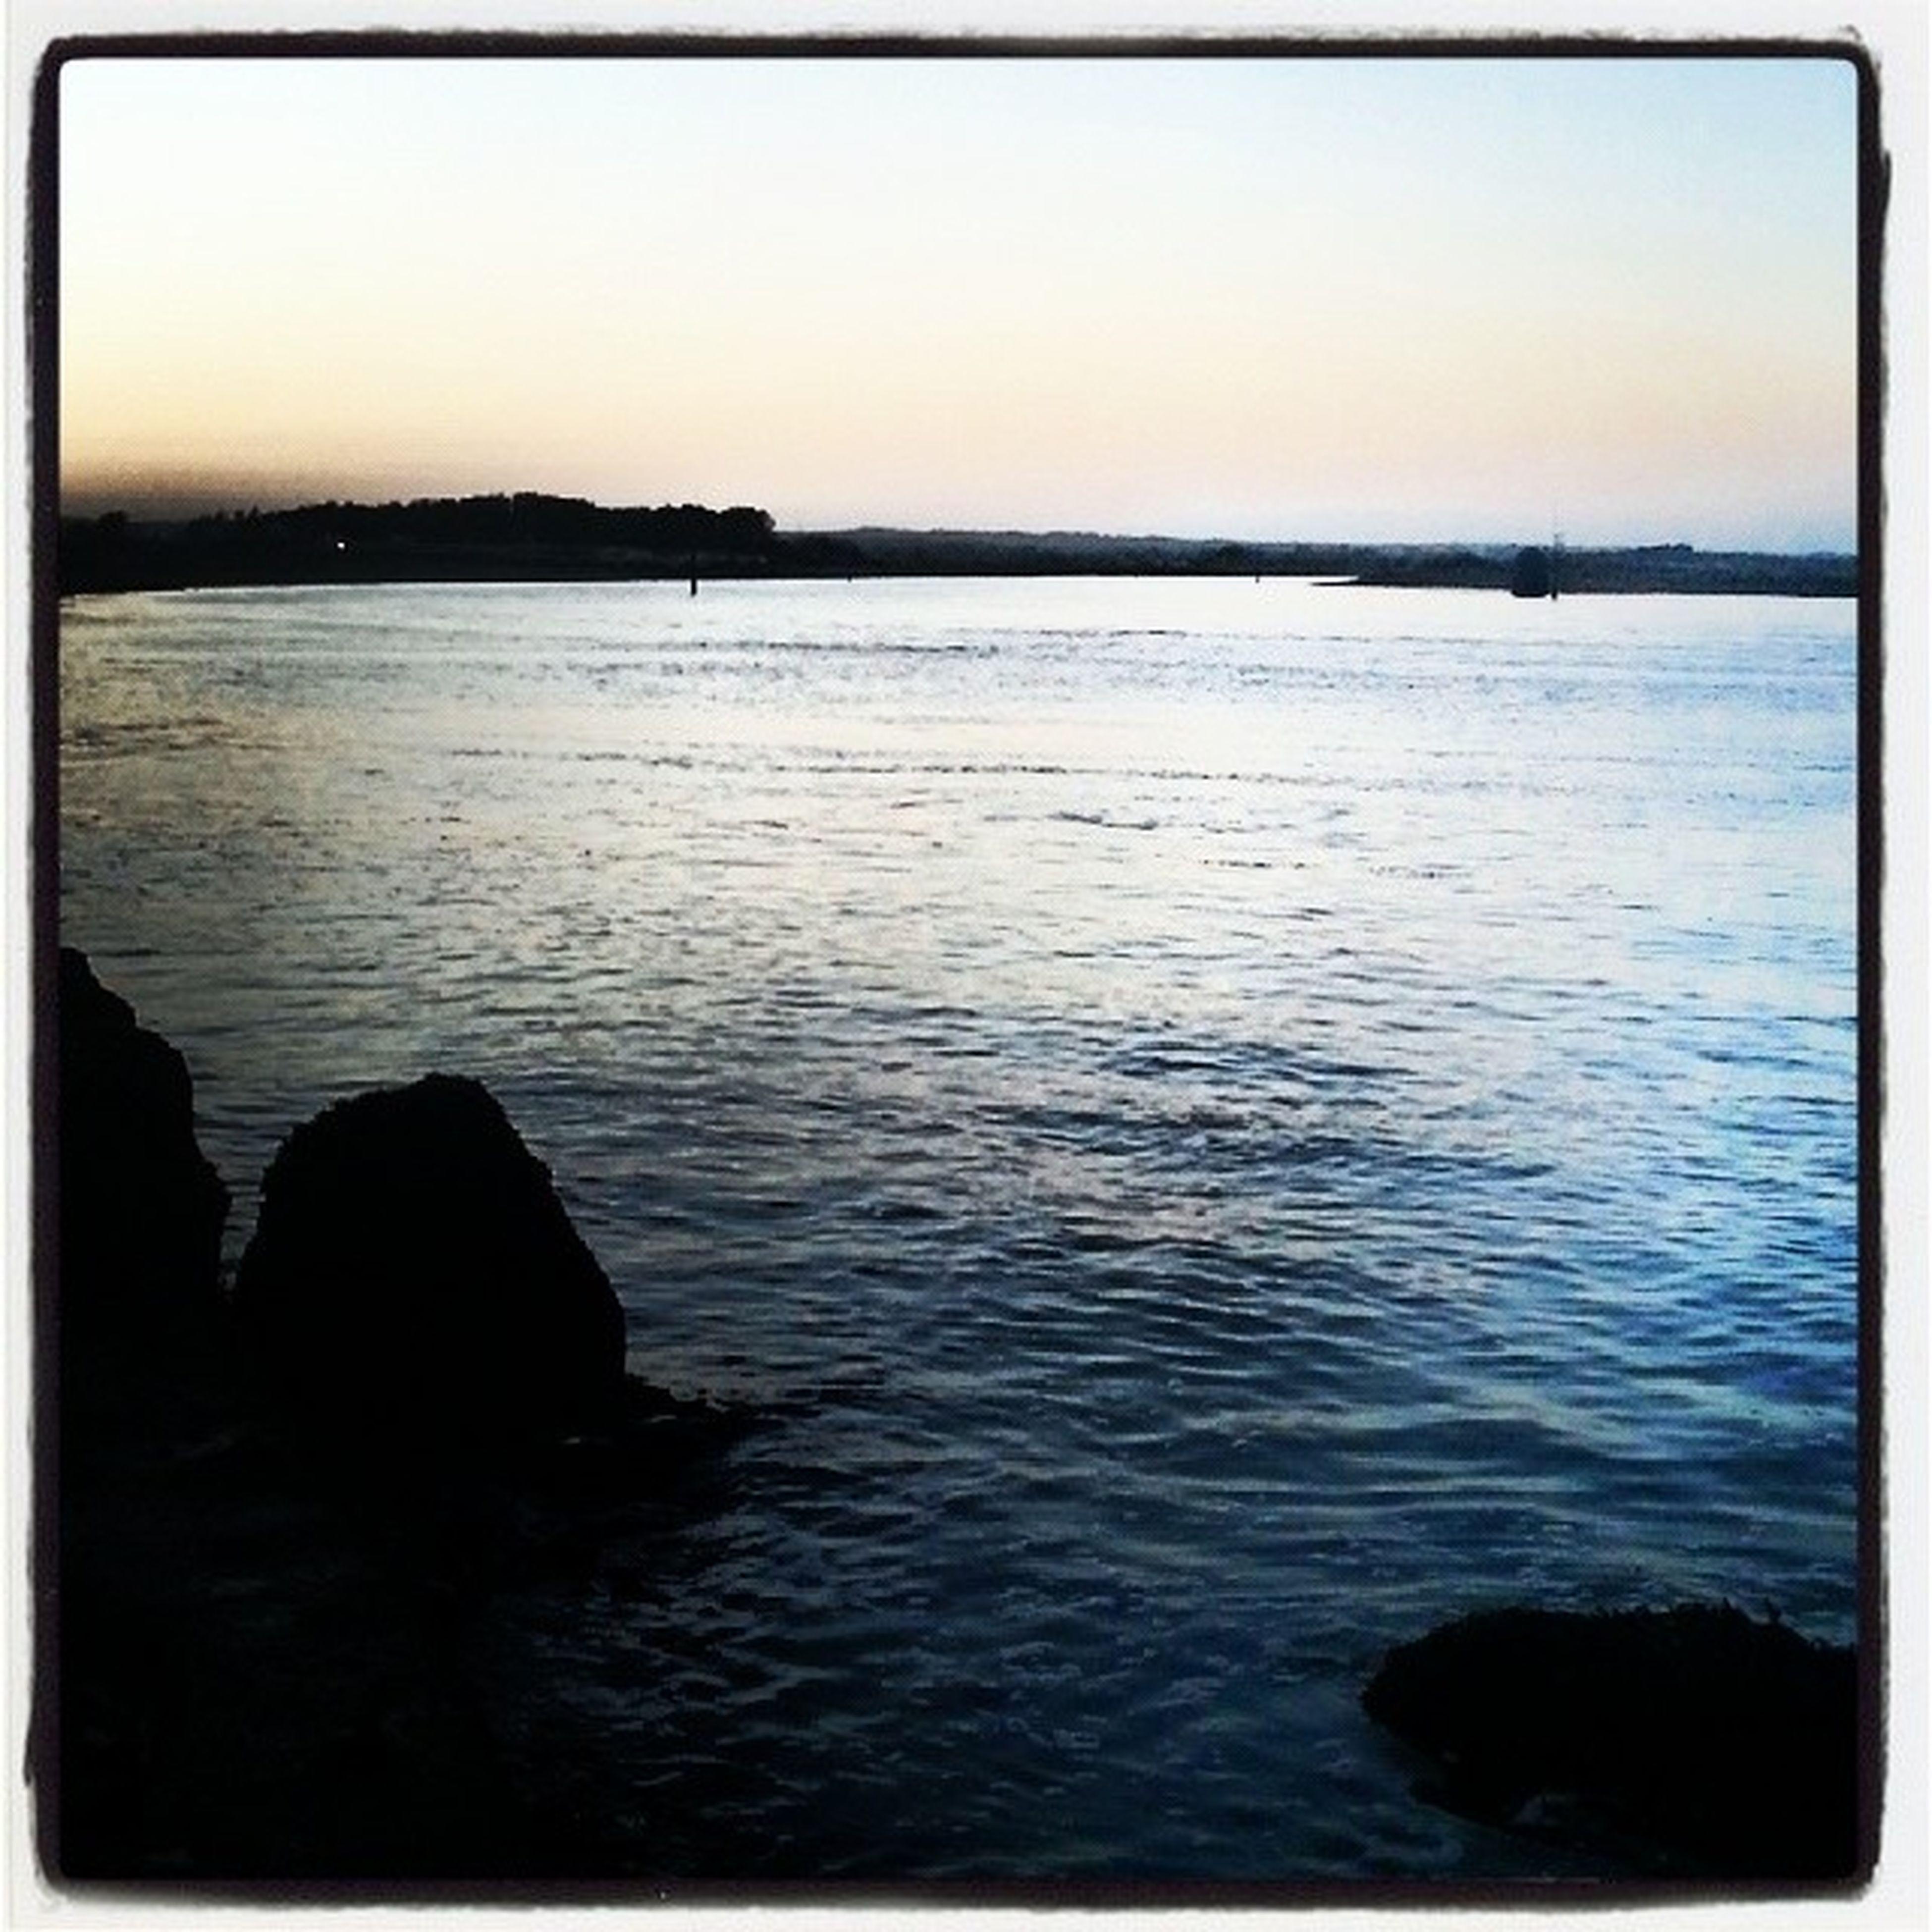 Ireland Spring2014 Beautiful Peaceful picoftheday instatag photooftheday happy insta_walk s3only mothernature amazing mornington seaporn ripples river_boyne tagstagram